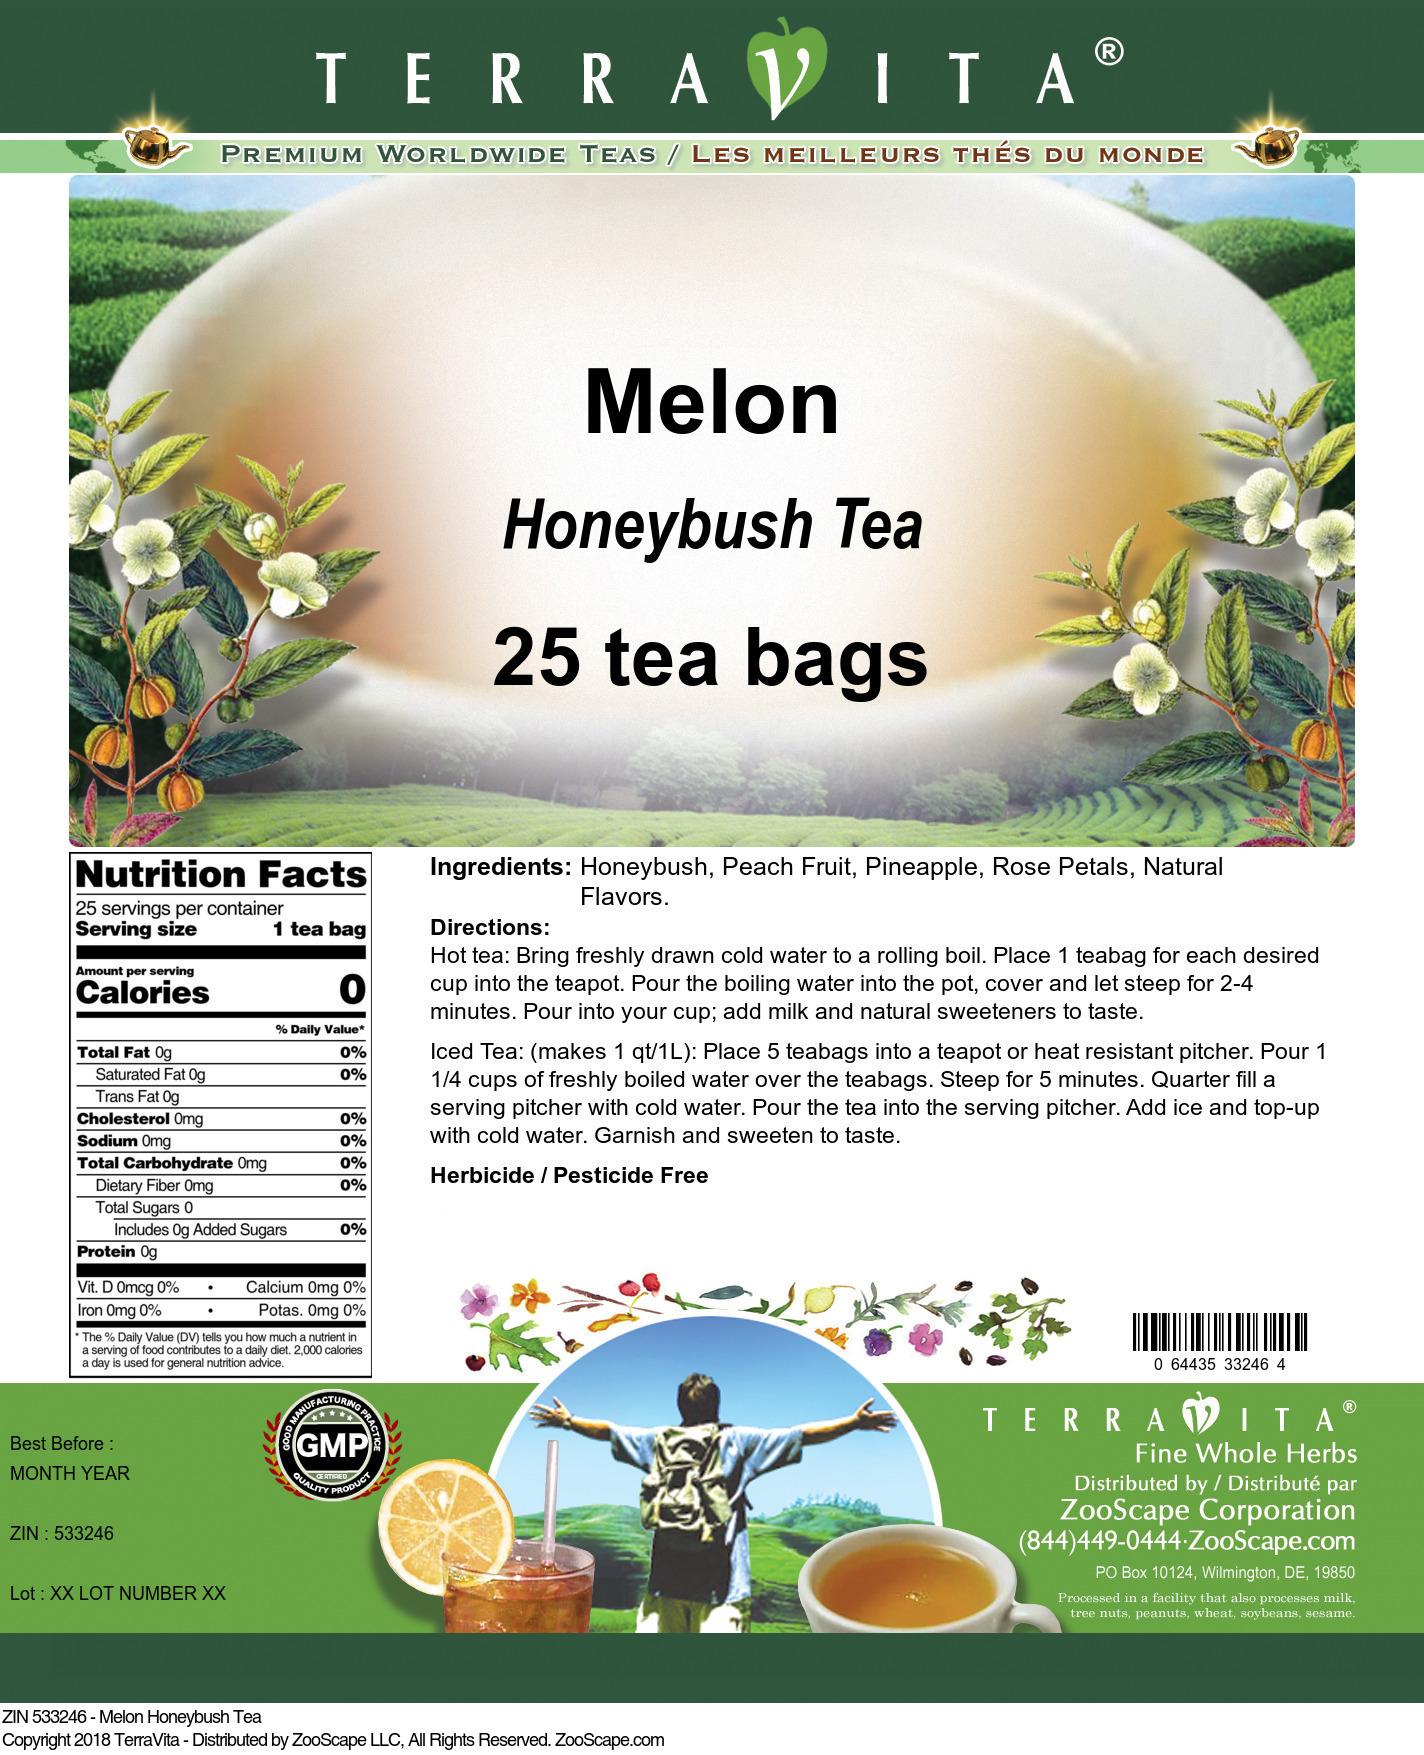 Melon Honeybush Tea